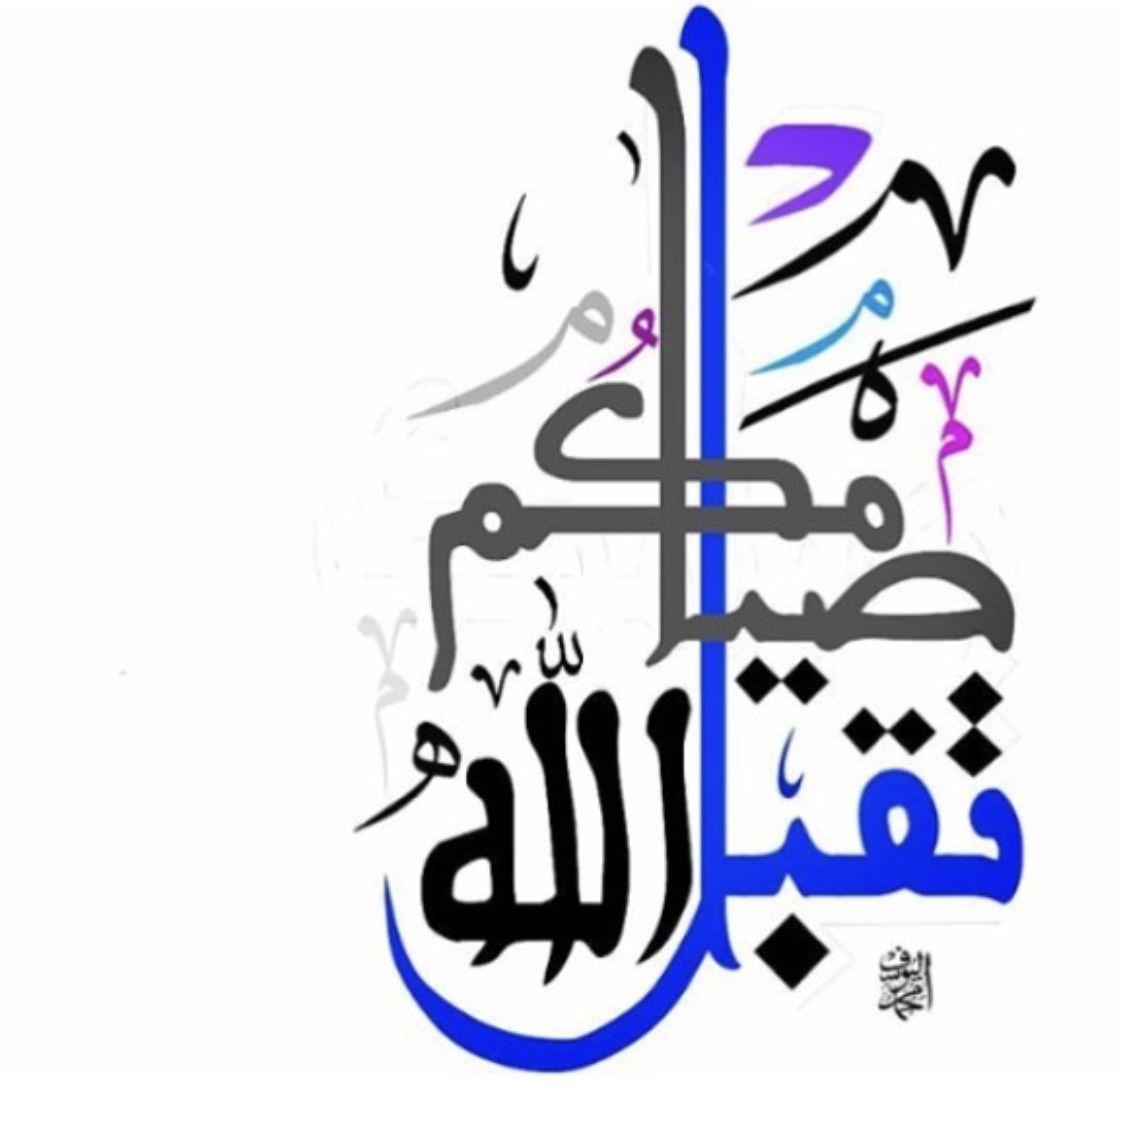 تقبل الله صيامكم Ramadan Islamic Calligraphy Painting Islamic Wallpaper Hd